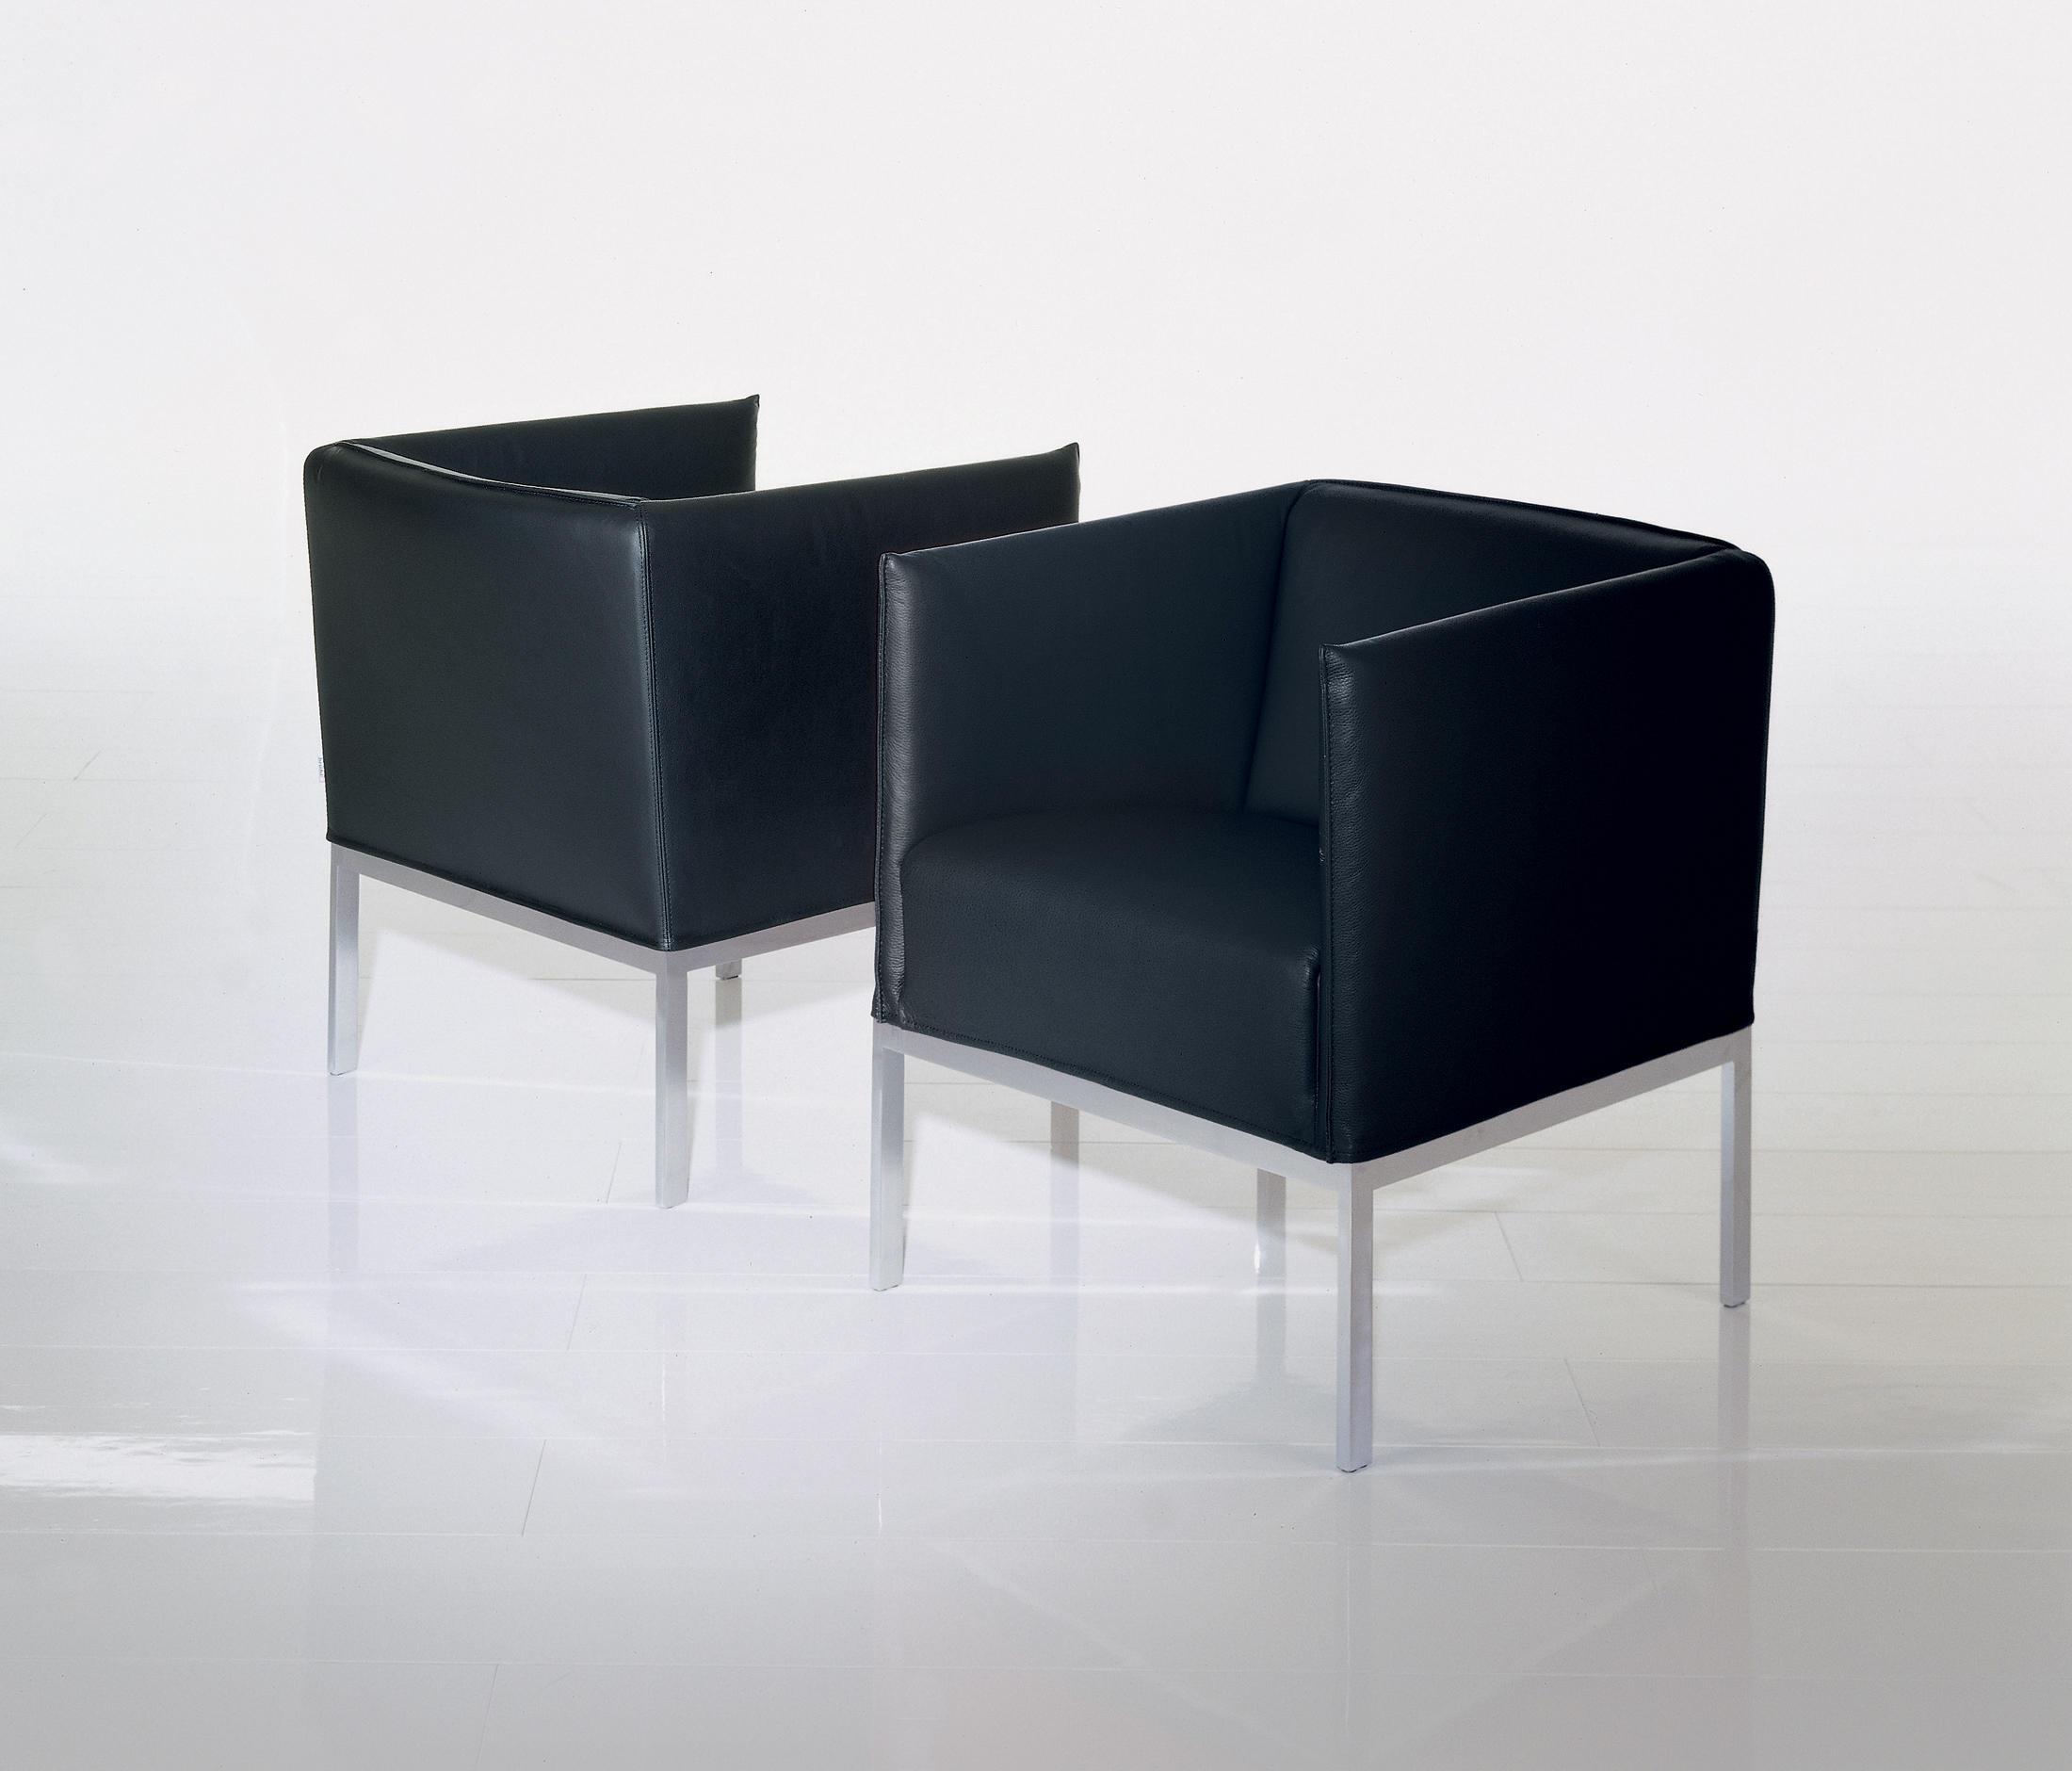 randolph 2 sofa sofas von br hl architonic. Black Bedroom Furniture Sets. Home Design Ideas